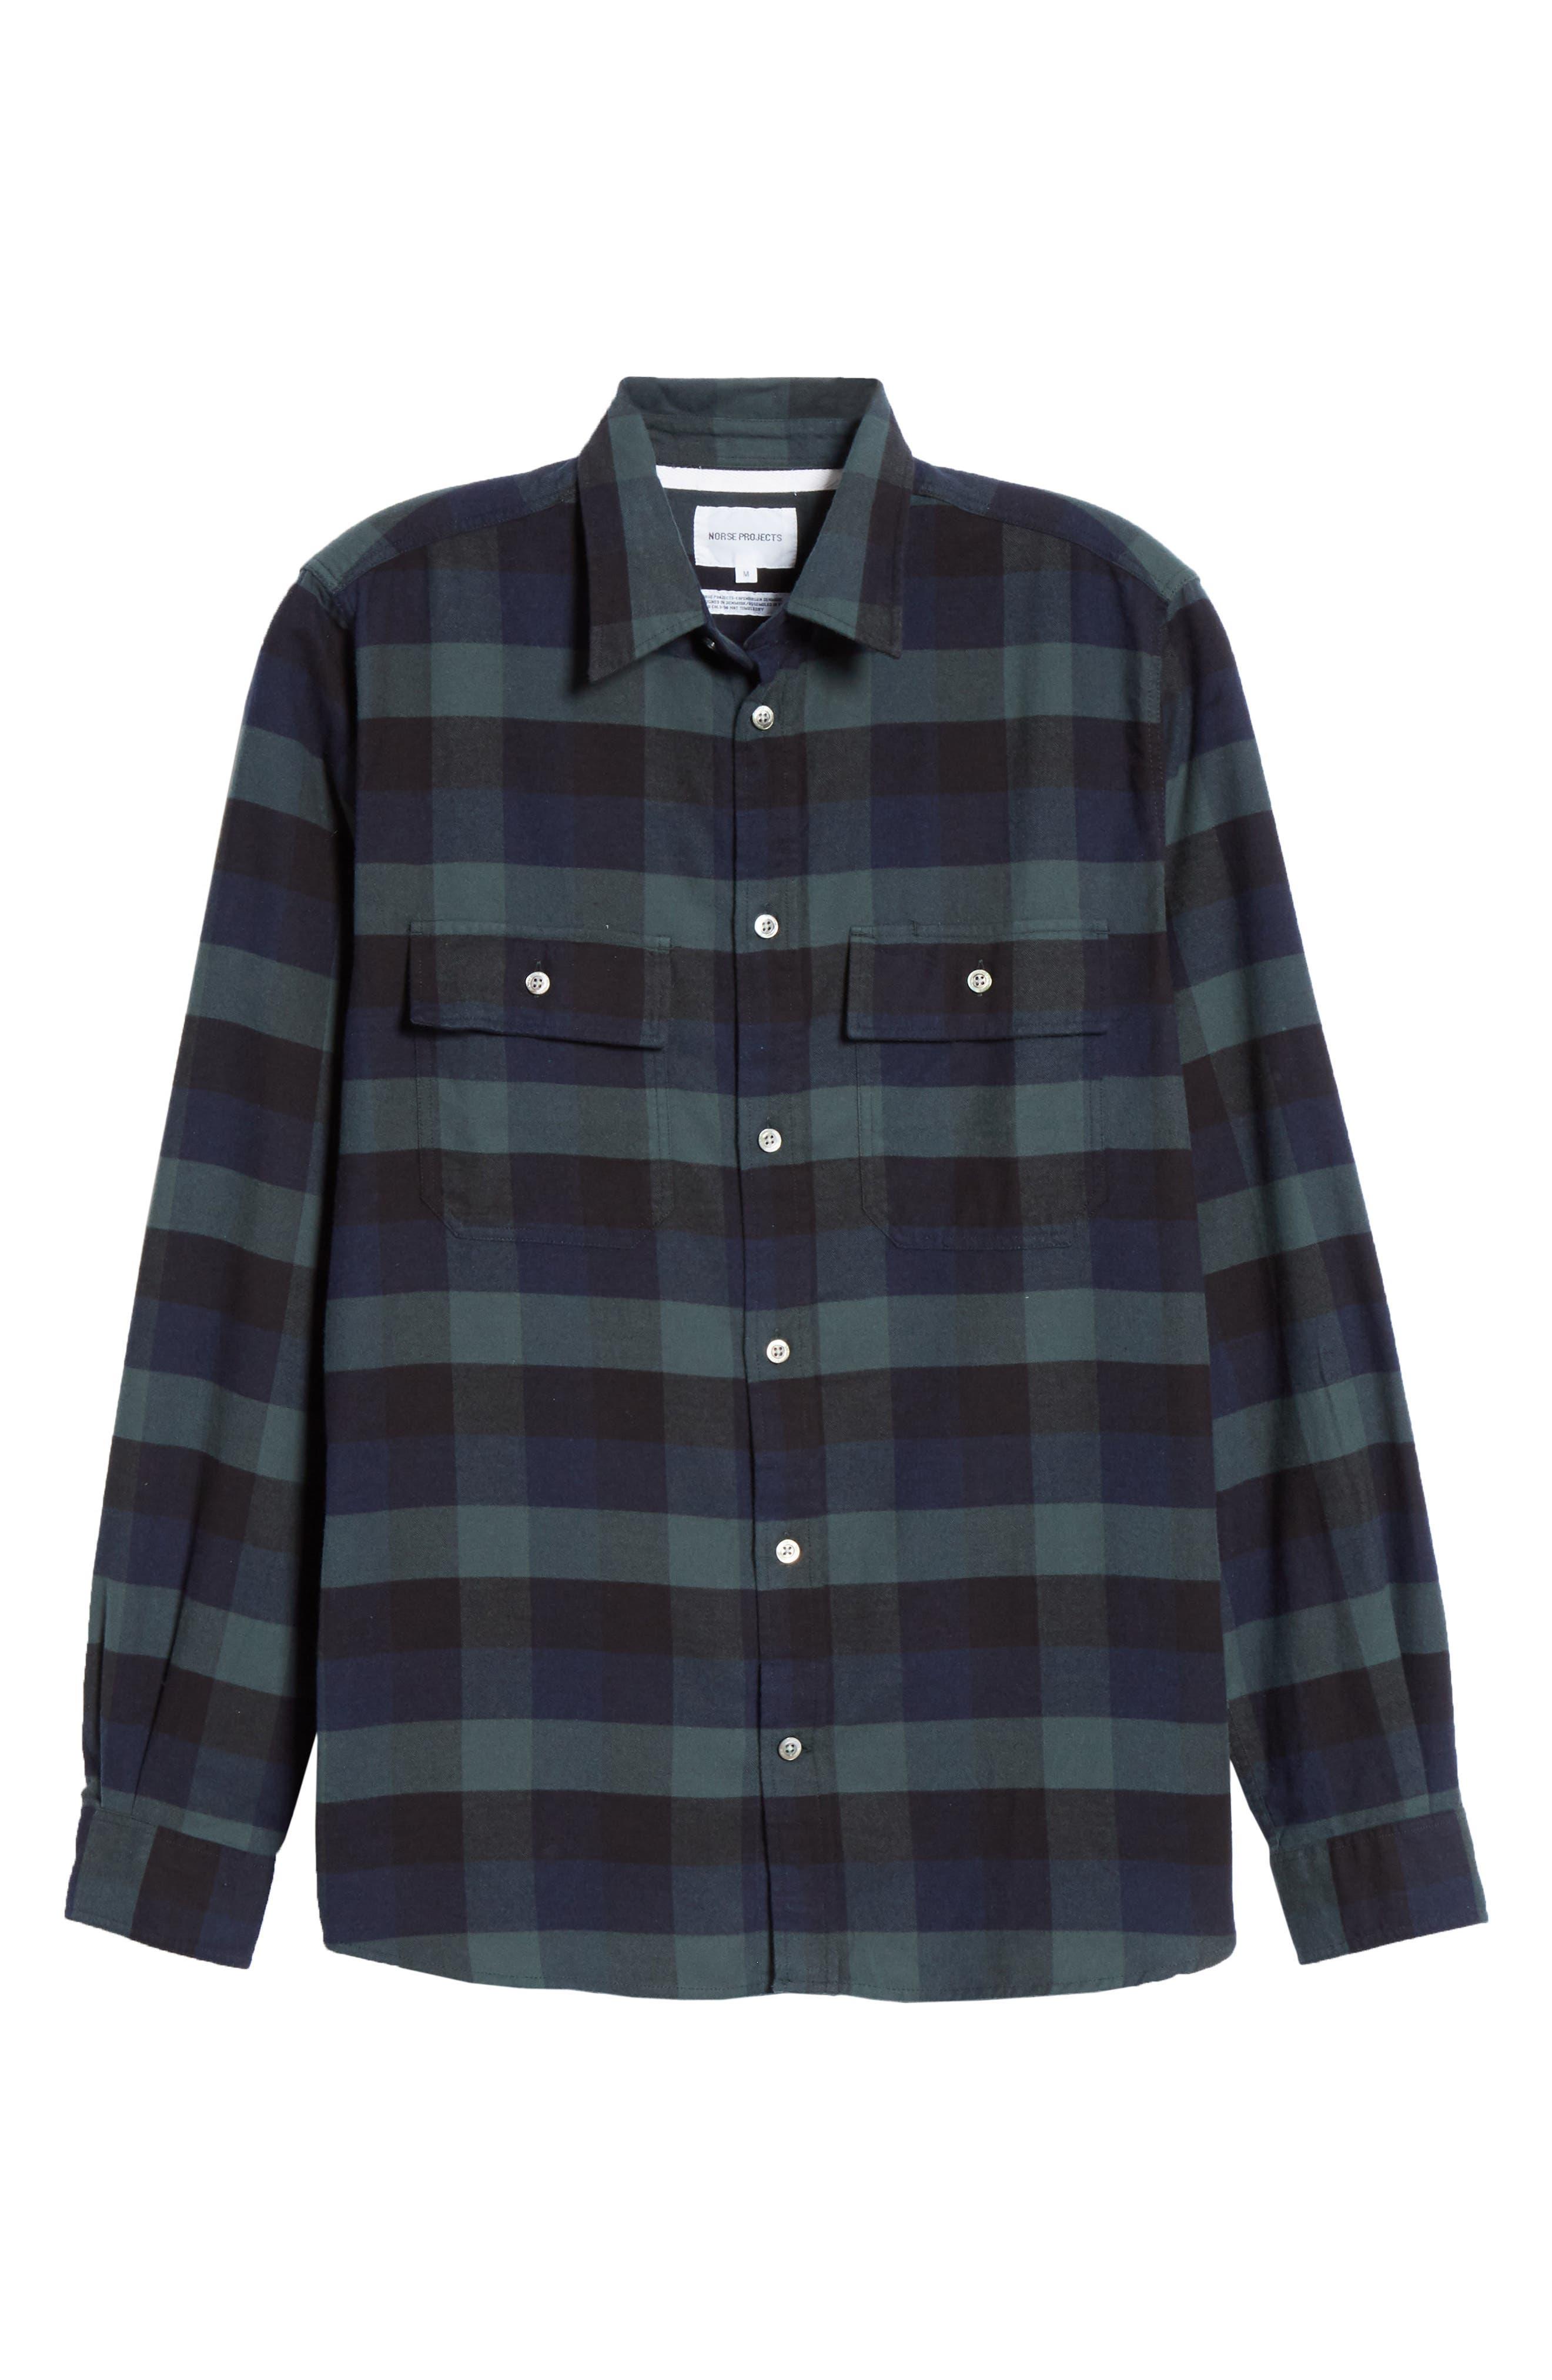 Villads Check Brushed Flannel Shirt,                             Alternate thumbnail 5, color,                             DARK NAVY